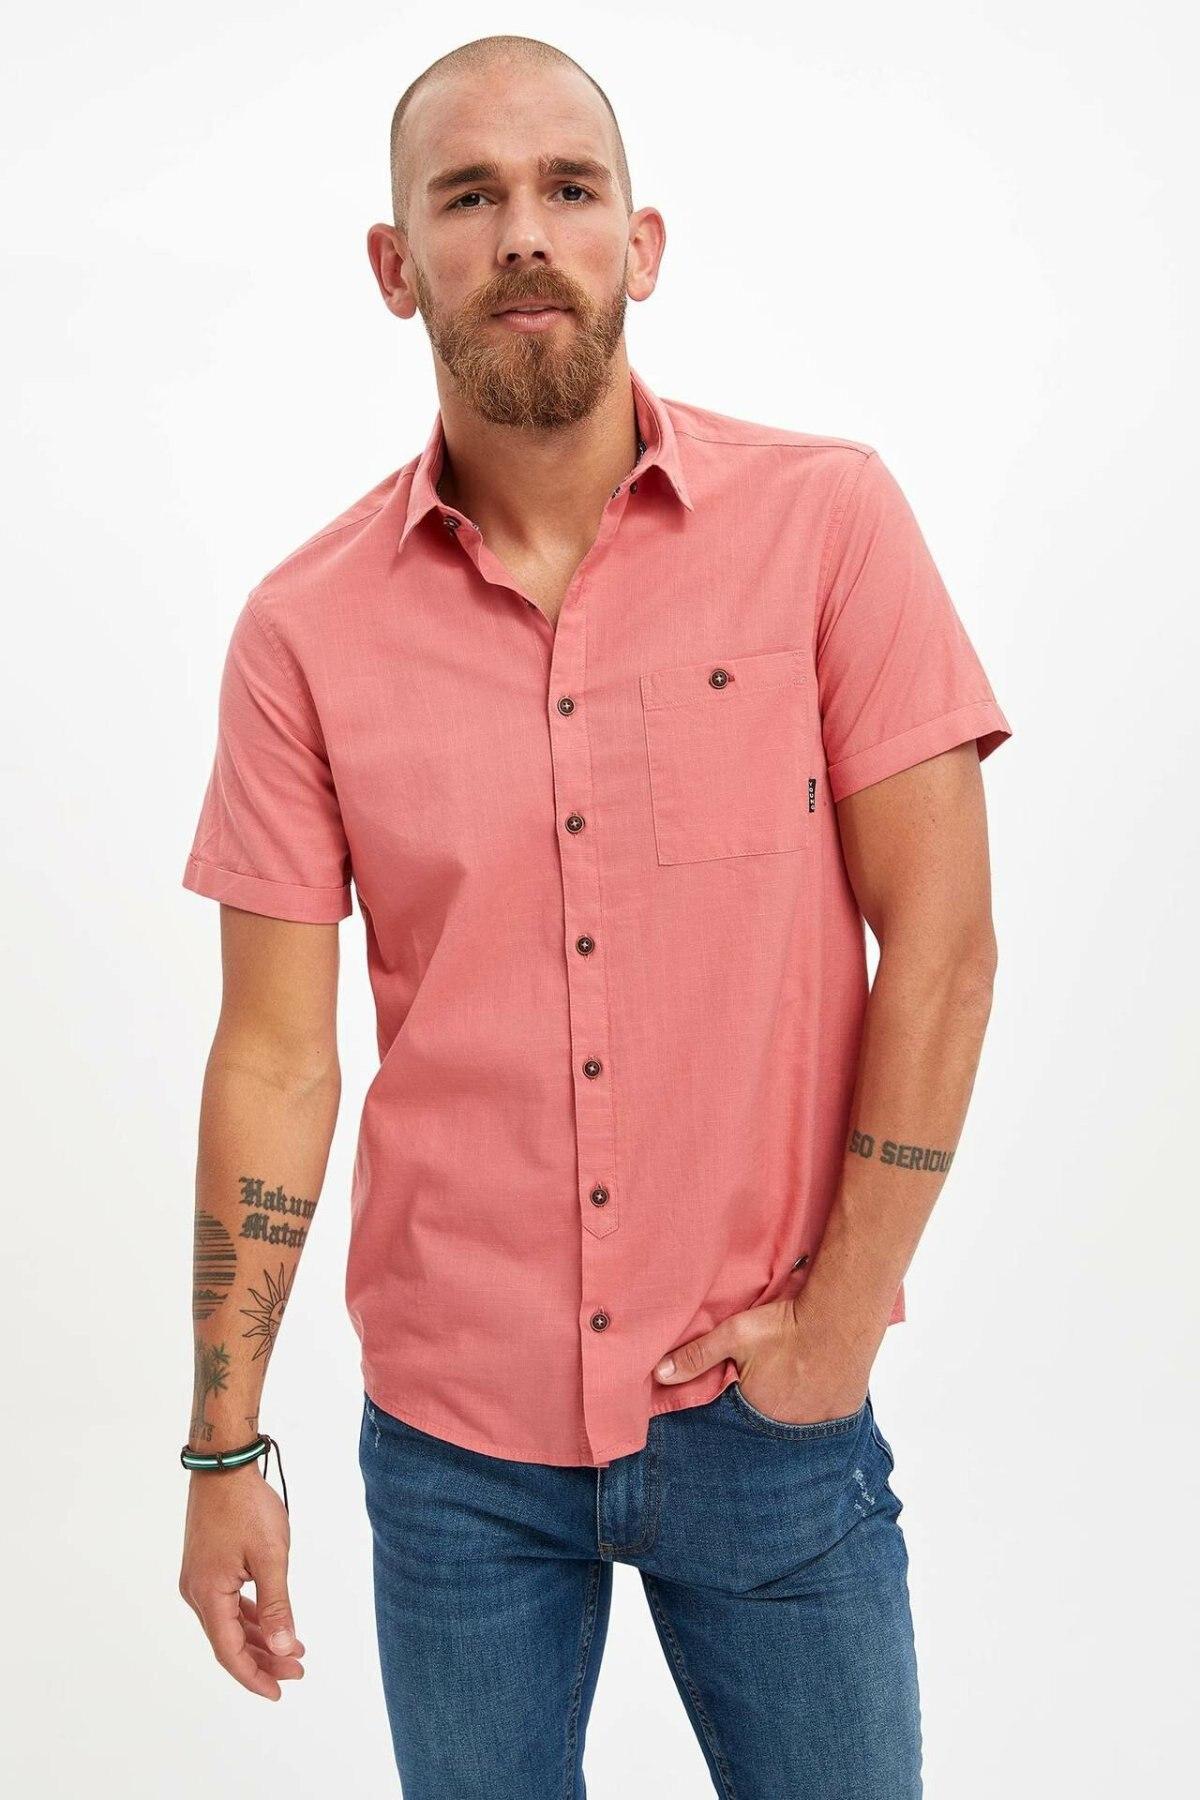 DeFacto Men Blue Pocket Simple Shirts Short Sleeve Casual Shirts Men Fashion Lapel Collar Shirt  - M3455AZ19SM